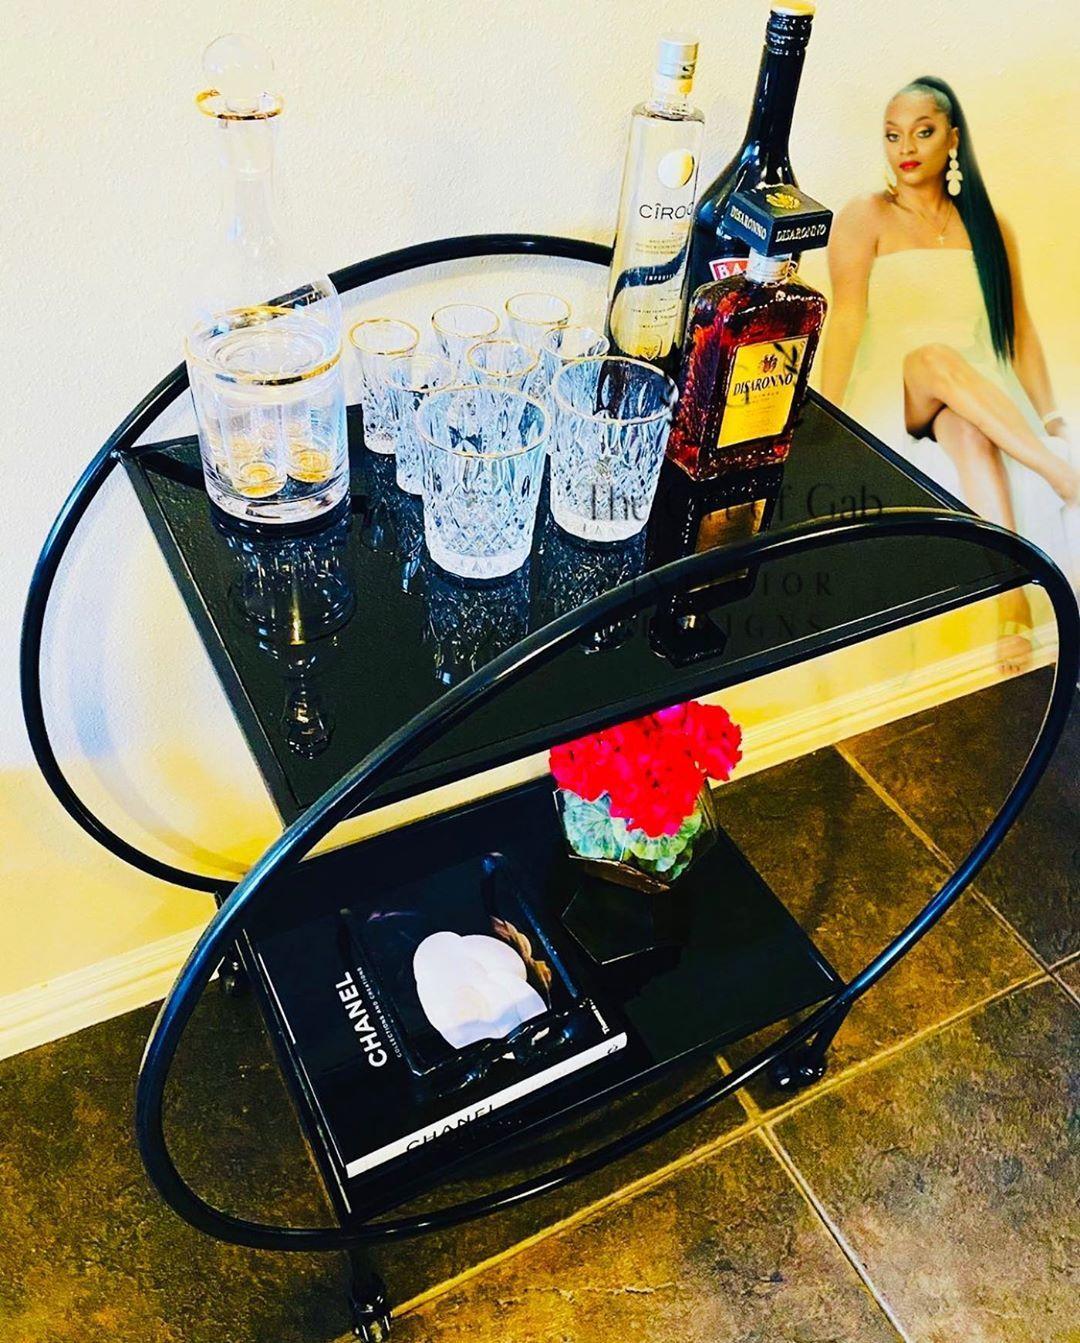 Just because it deserves its own post 😍😍😍BEFORE I changed it to white, Ill upload the white later 😜 #bedroomdecor #athome #homegoods #burlington #hobbylobby #teenroom #homedesign #homemakeover #DIY #interiordecorator #athome #homedecor #homefurnishings #lavishliving #ilovedecor #accentpieces #accentchair #zgallerie #luxurybedroom #houstoninteriordesigner #homeownership #homesweethome #homegoodsfinds #homeownershipgoals  #luxurylifestyle #luxuriousliving #amazon #homegoods #rossfinds #burling